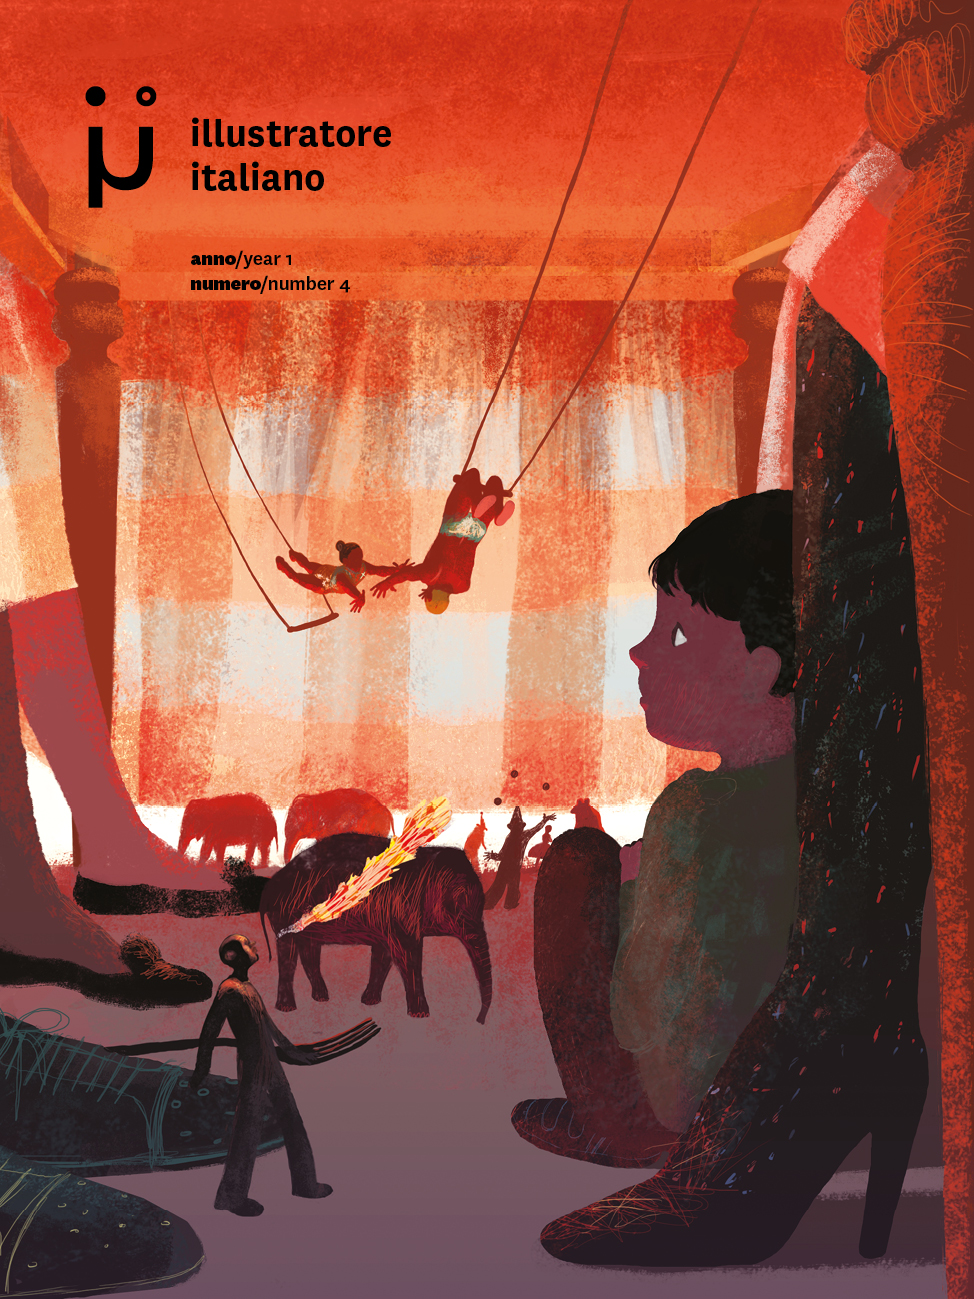 ILIT-cover 4